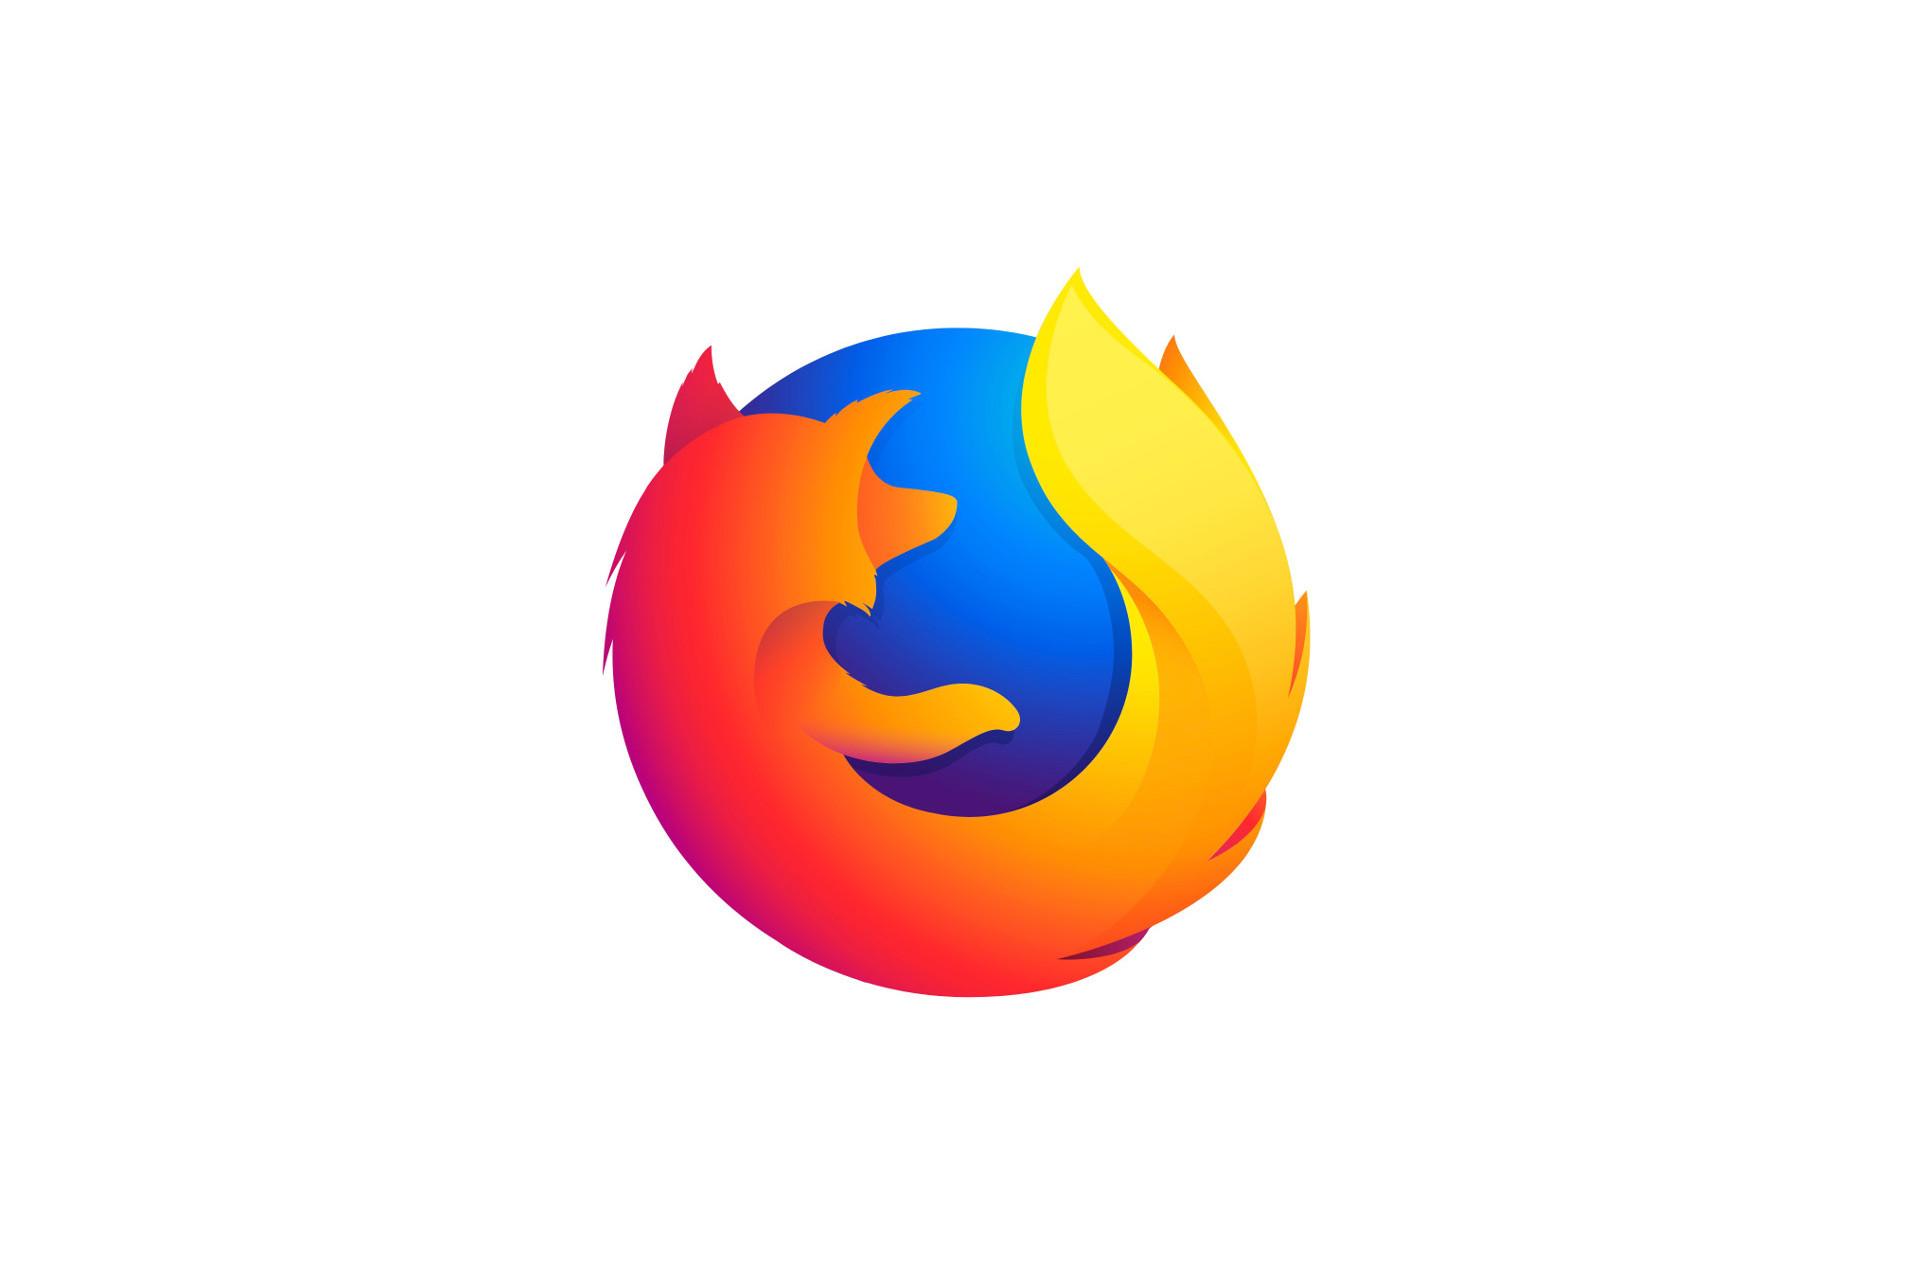 Das Firefox Logo